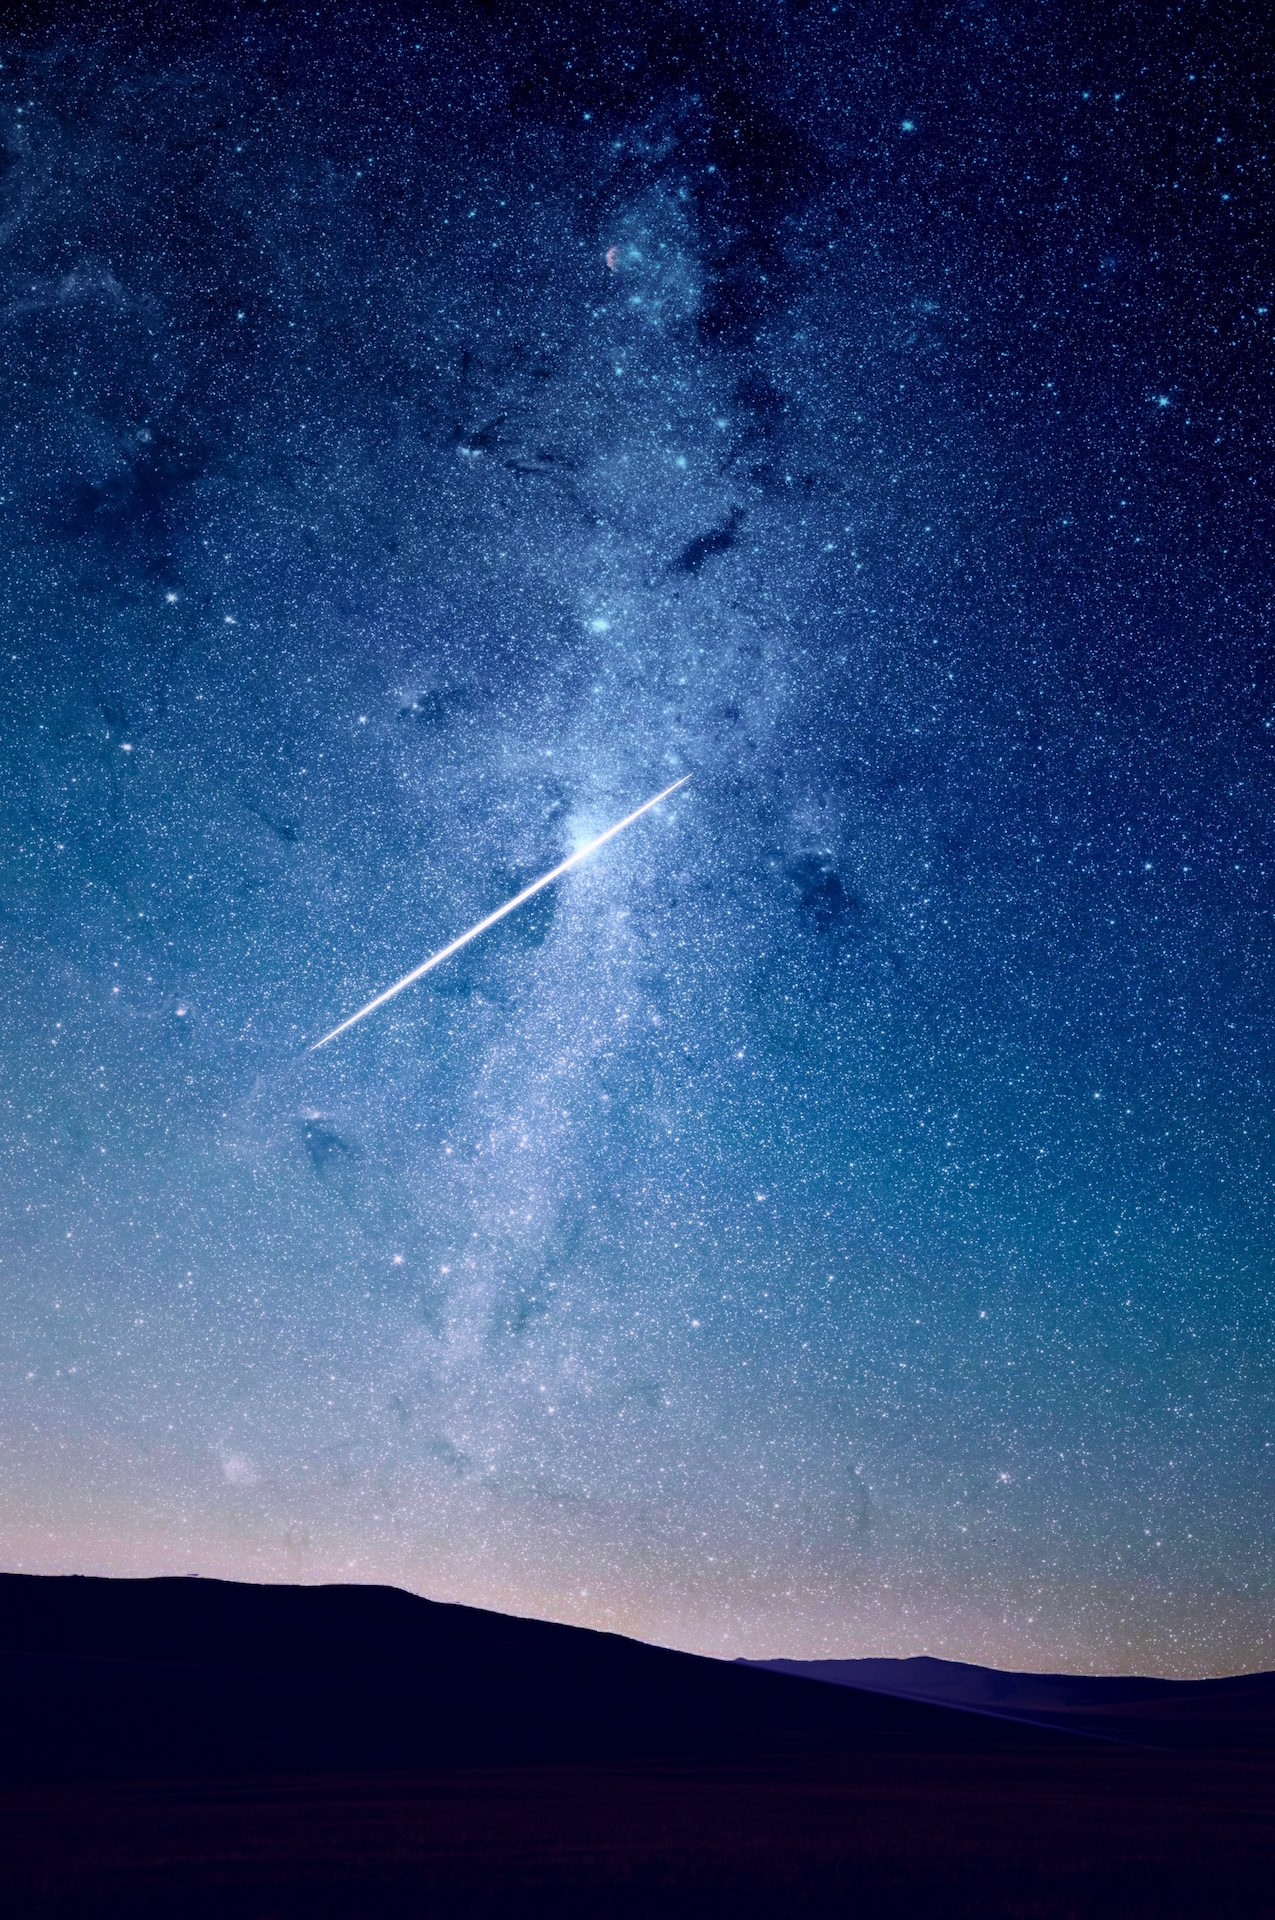 noche, cielo, estrellas, fugaz, deseo - Fondos de Pantalla HD - professor-falken.com